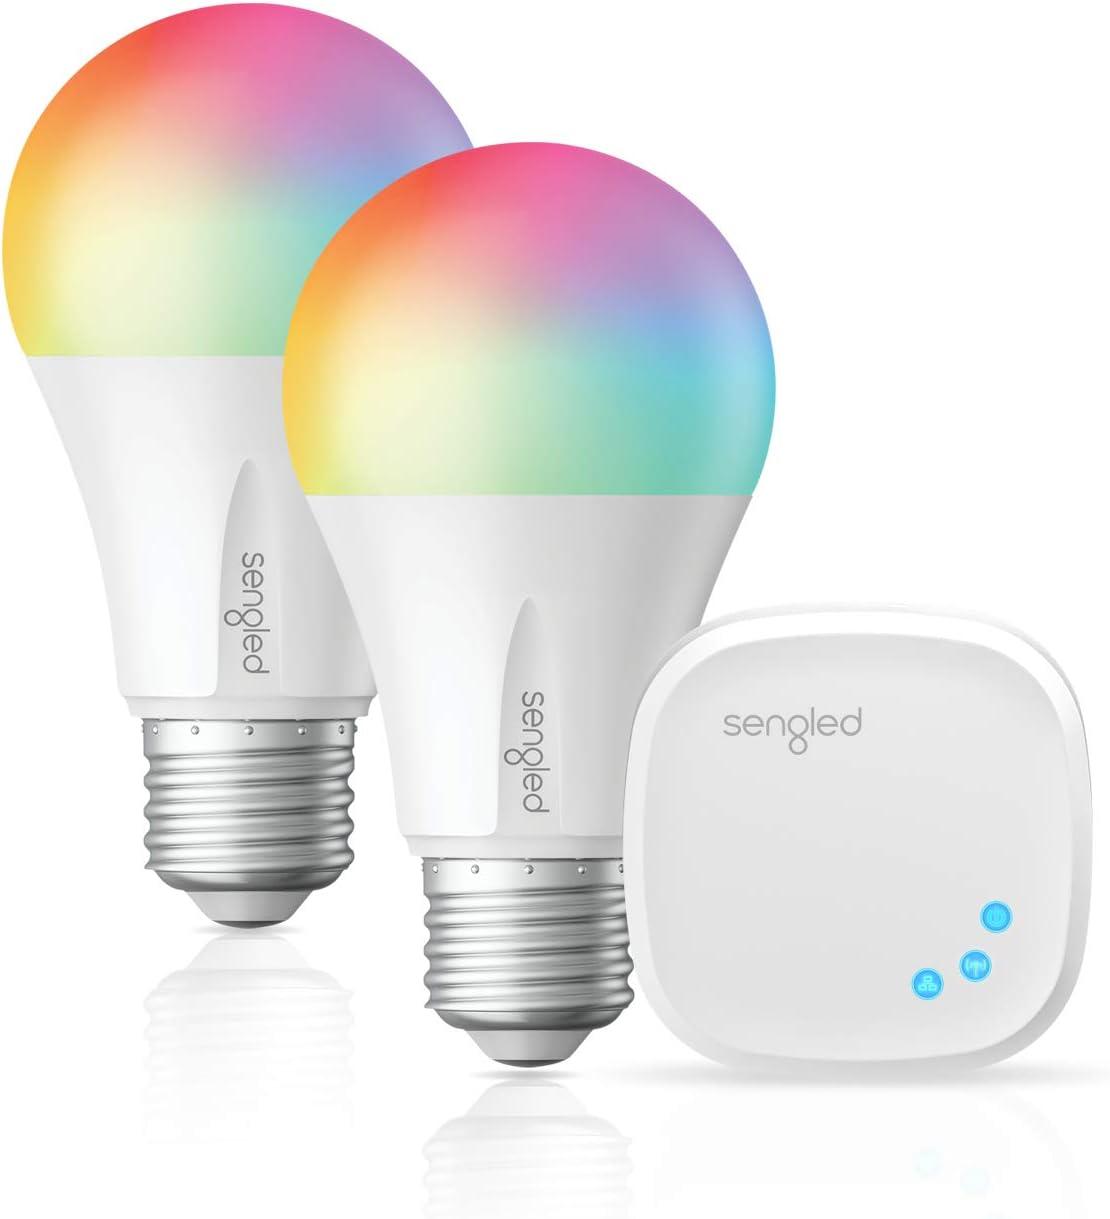 Sengled Smart Light Bulb, LED Light Bulb that Works with Alexa, Google Home, Siri, RGB Color Changing Bulb, A19 E26 Alexa Light bulbs, Dimmable Bulbs 60W Equivalent, 800LM, Hub Required, 2Pack & 1 Hub